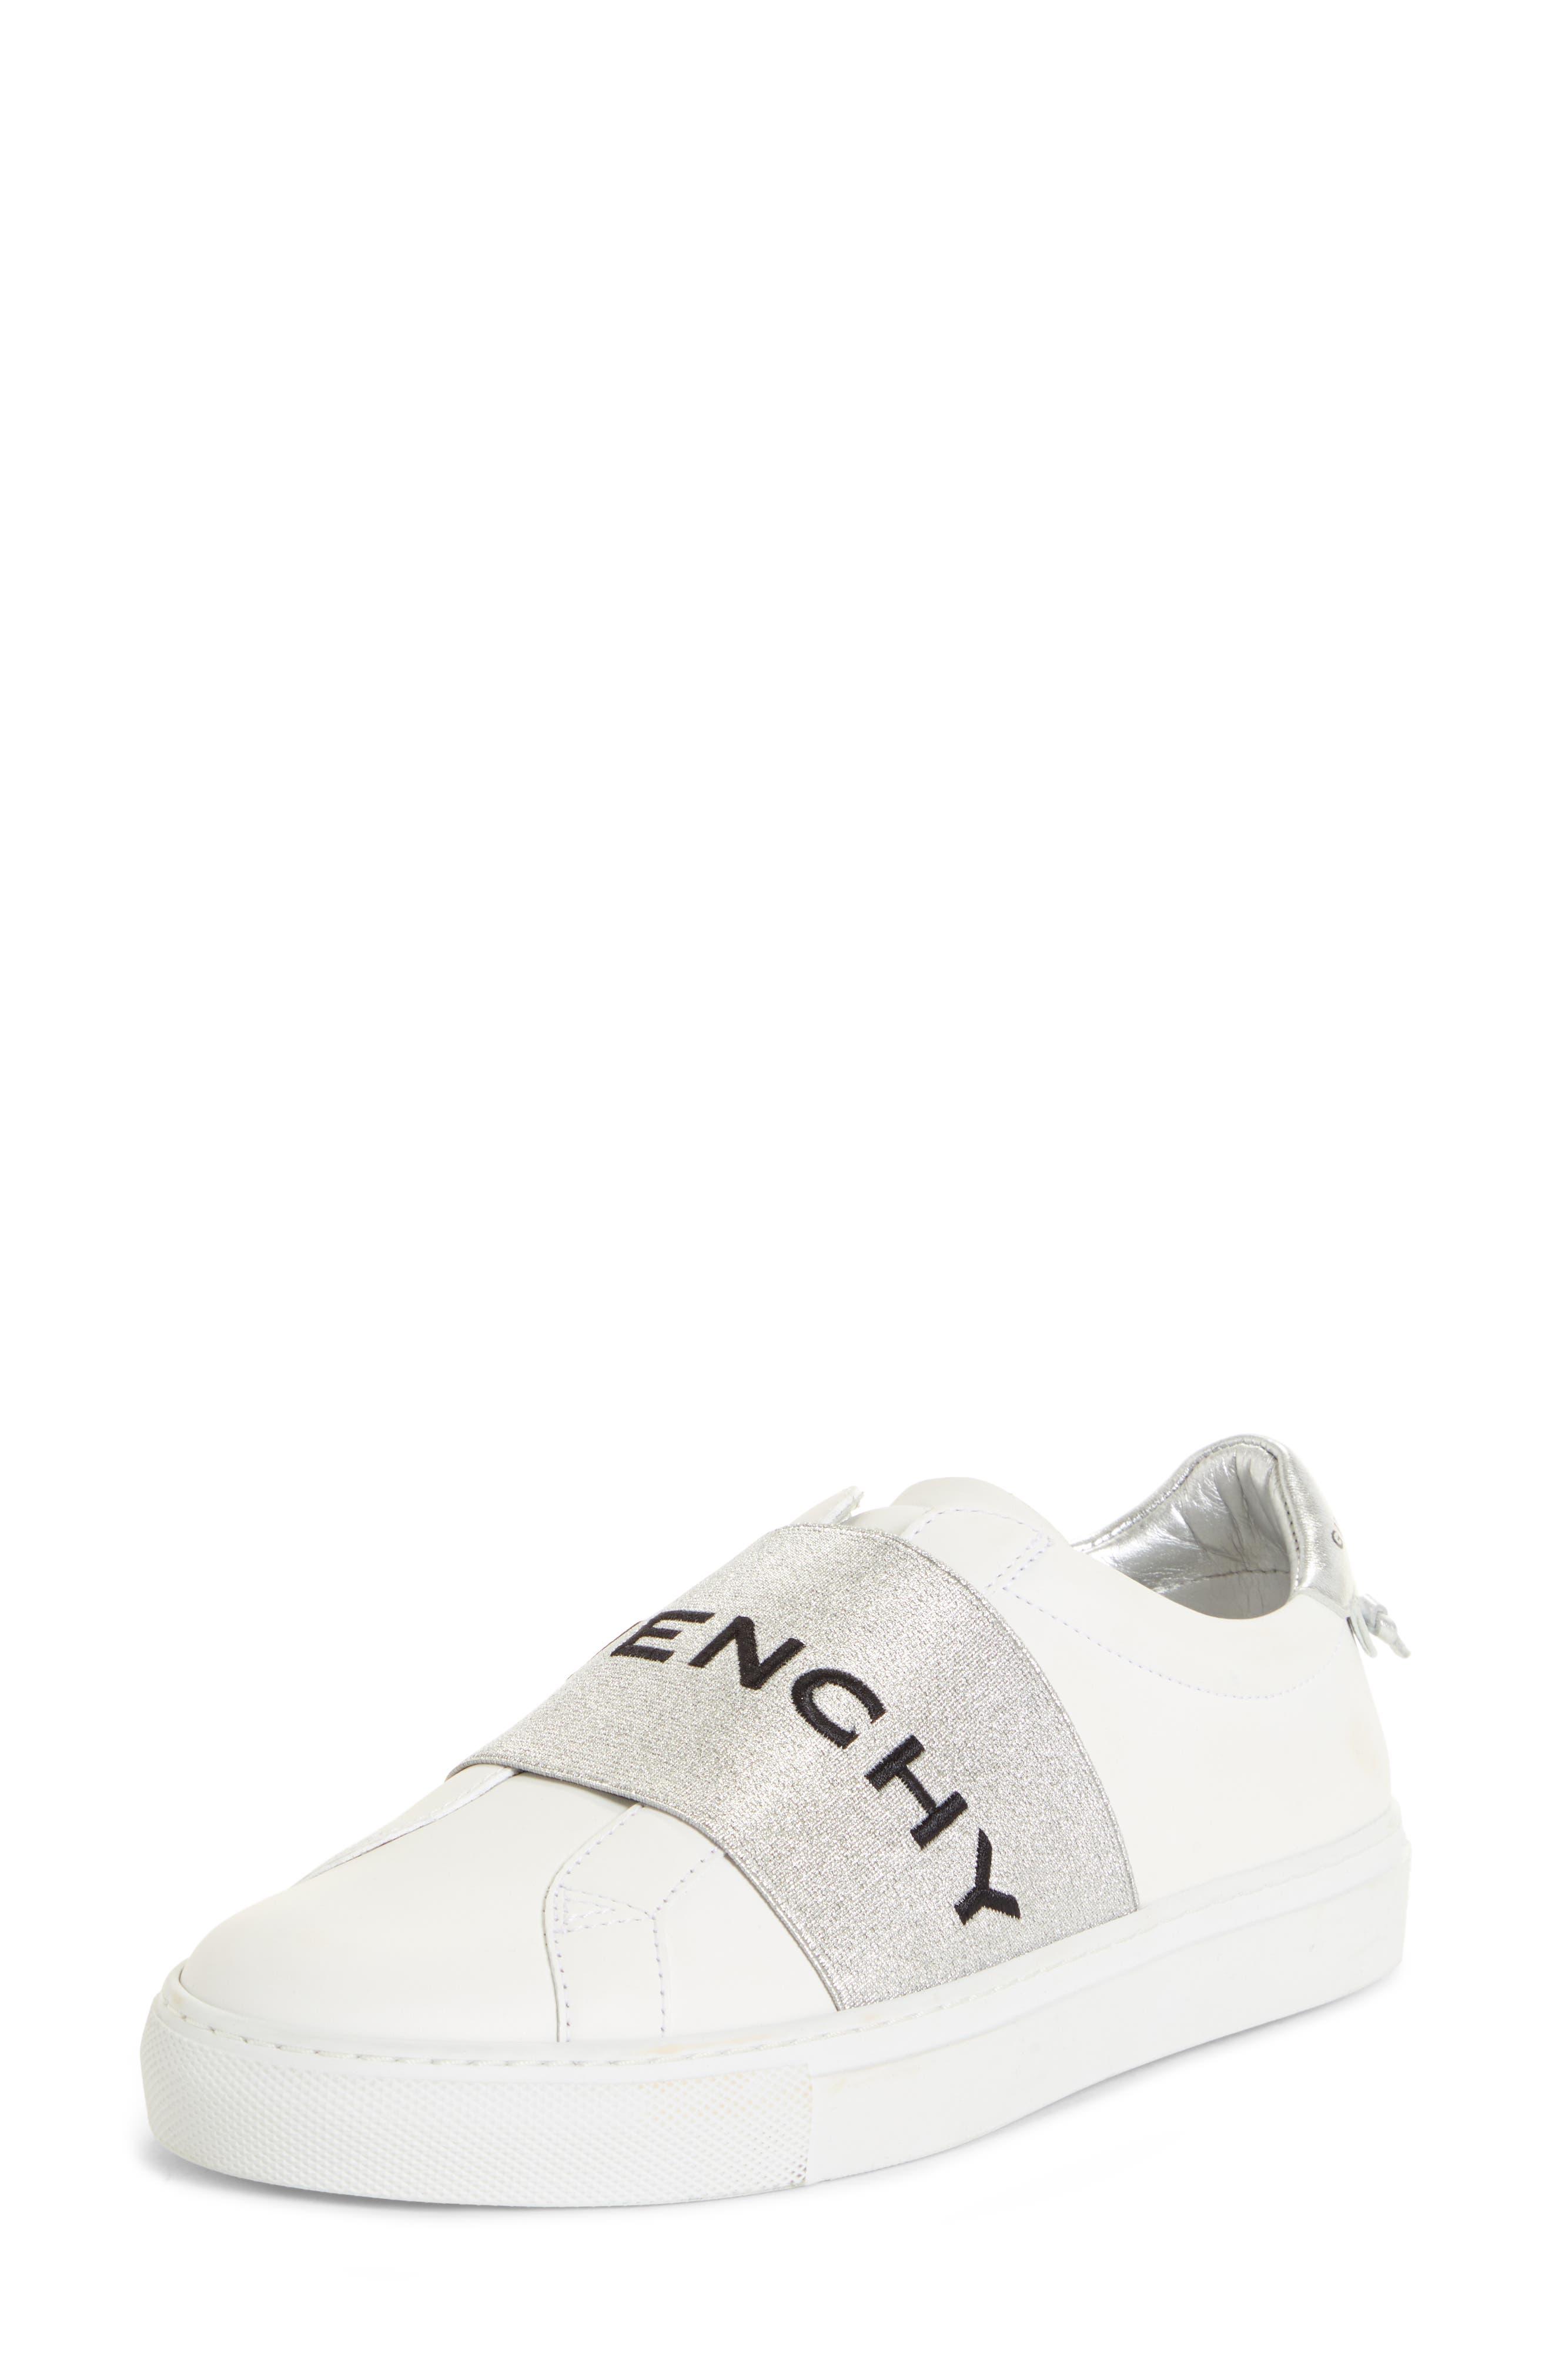 Givenchy Logo Strap Slip-On Sneaker, White